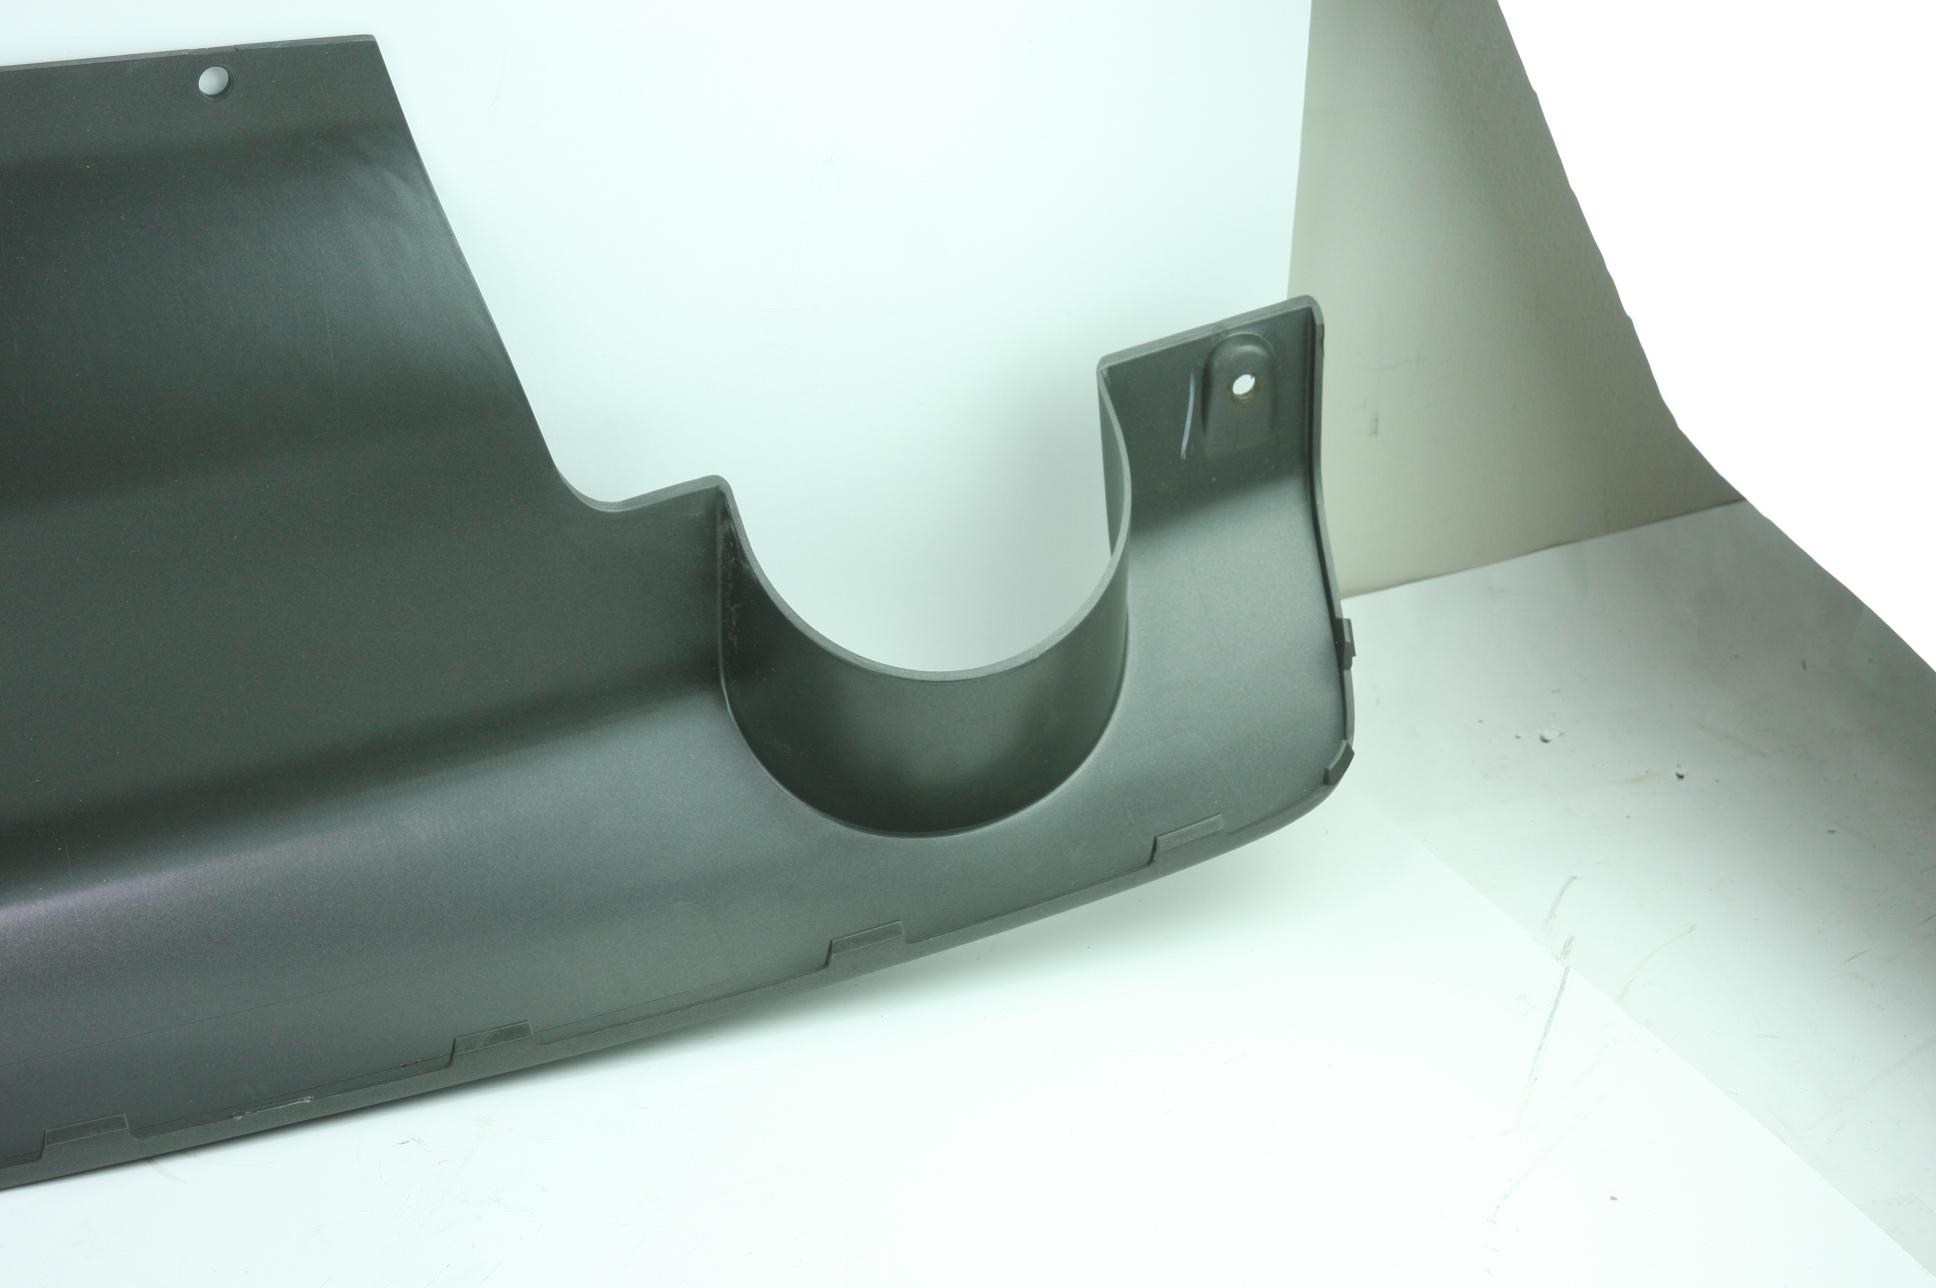 * New Genuine OEM GM 25747970 Cadillac 05-07 STS Rear Bumper Insert Panel NIP - image 10